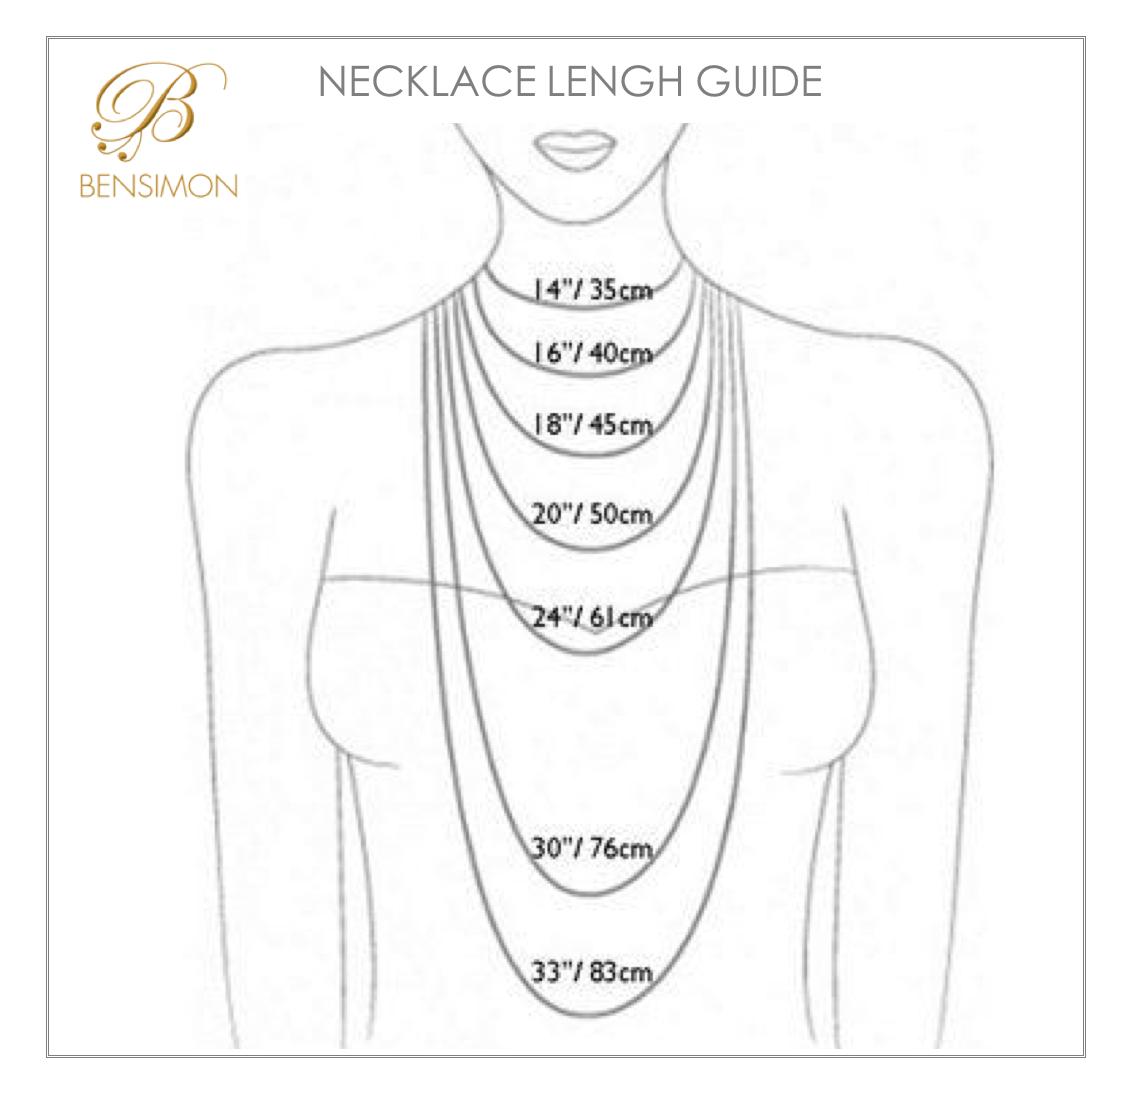 Necklace Length Diagram Necklace Length Guide Bensimonboutique2018